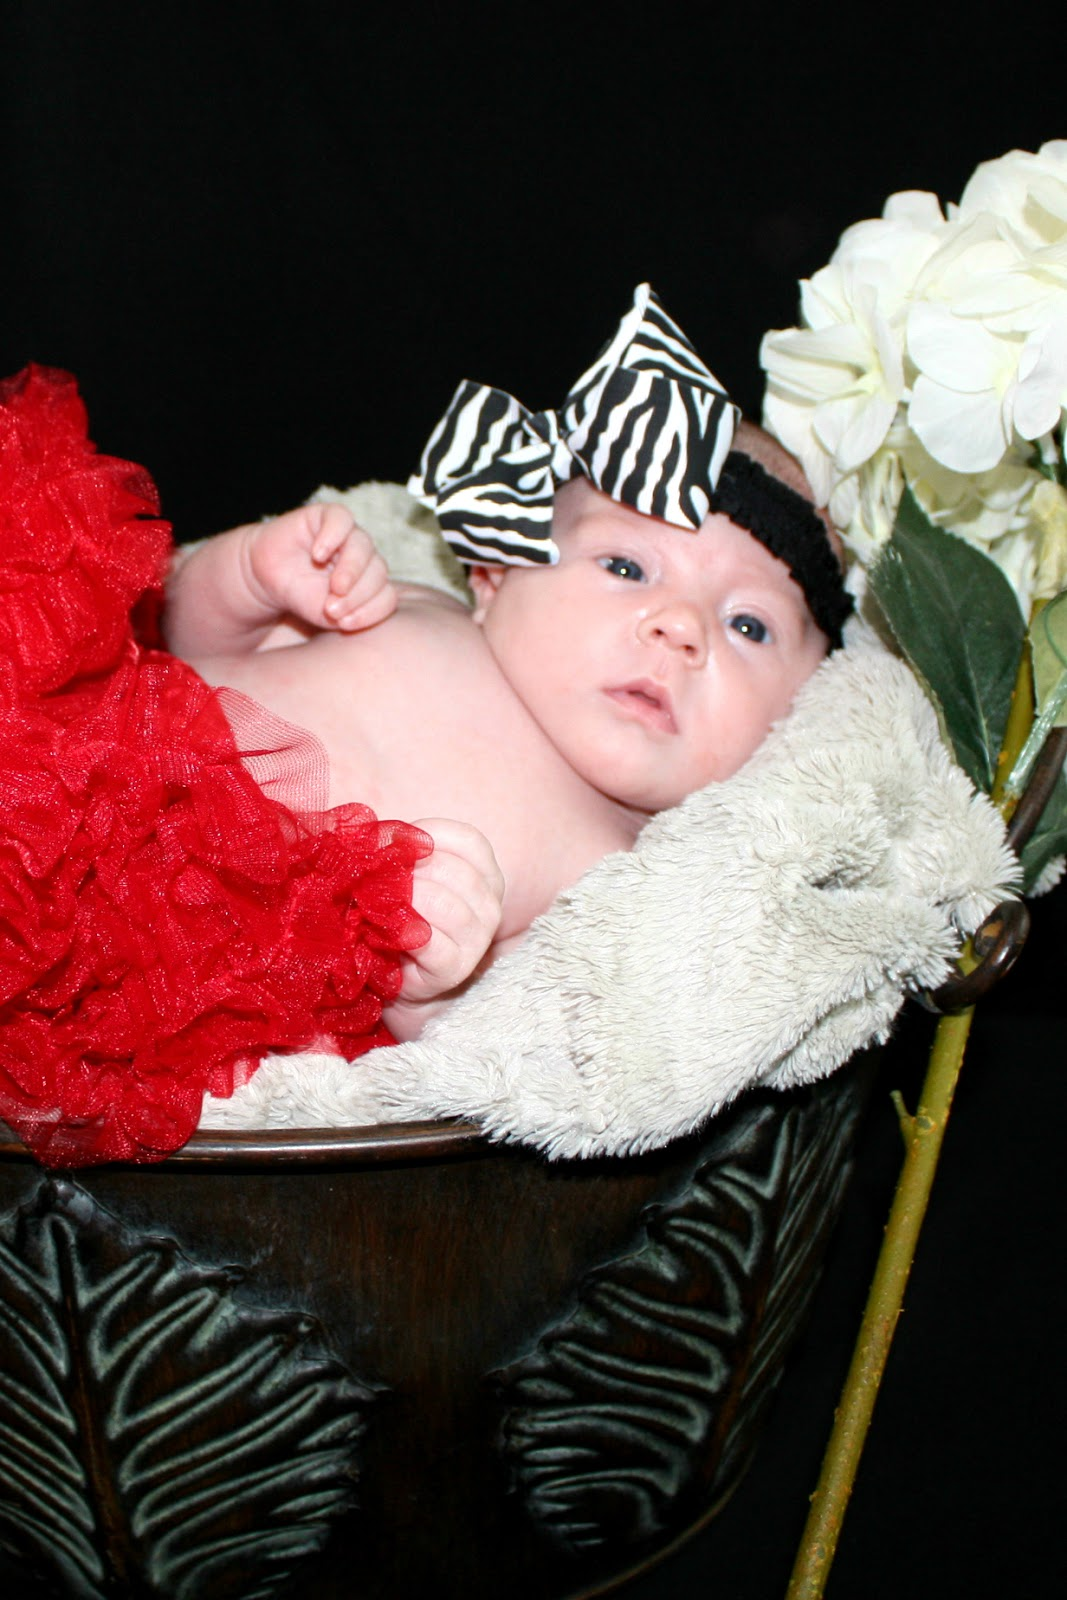 Beauty101bylisa Diy At Home Professional Newborn Photo Shoot